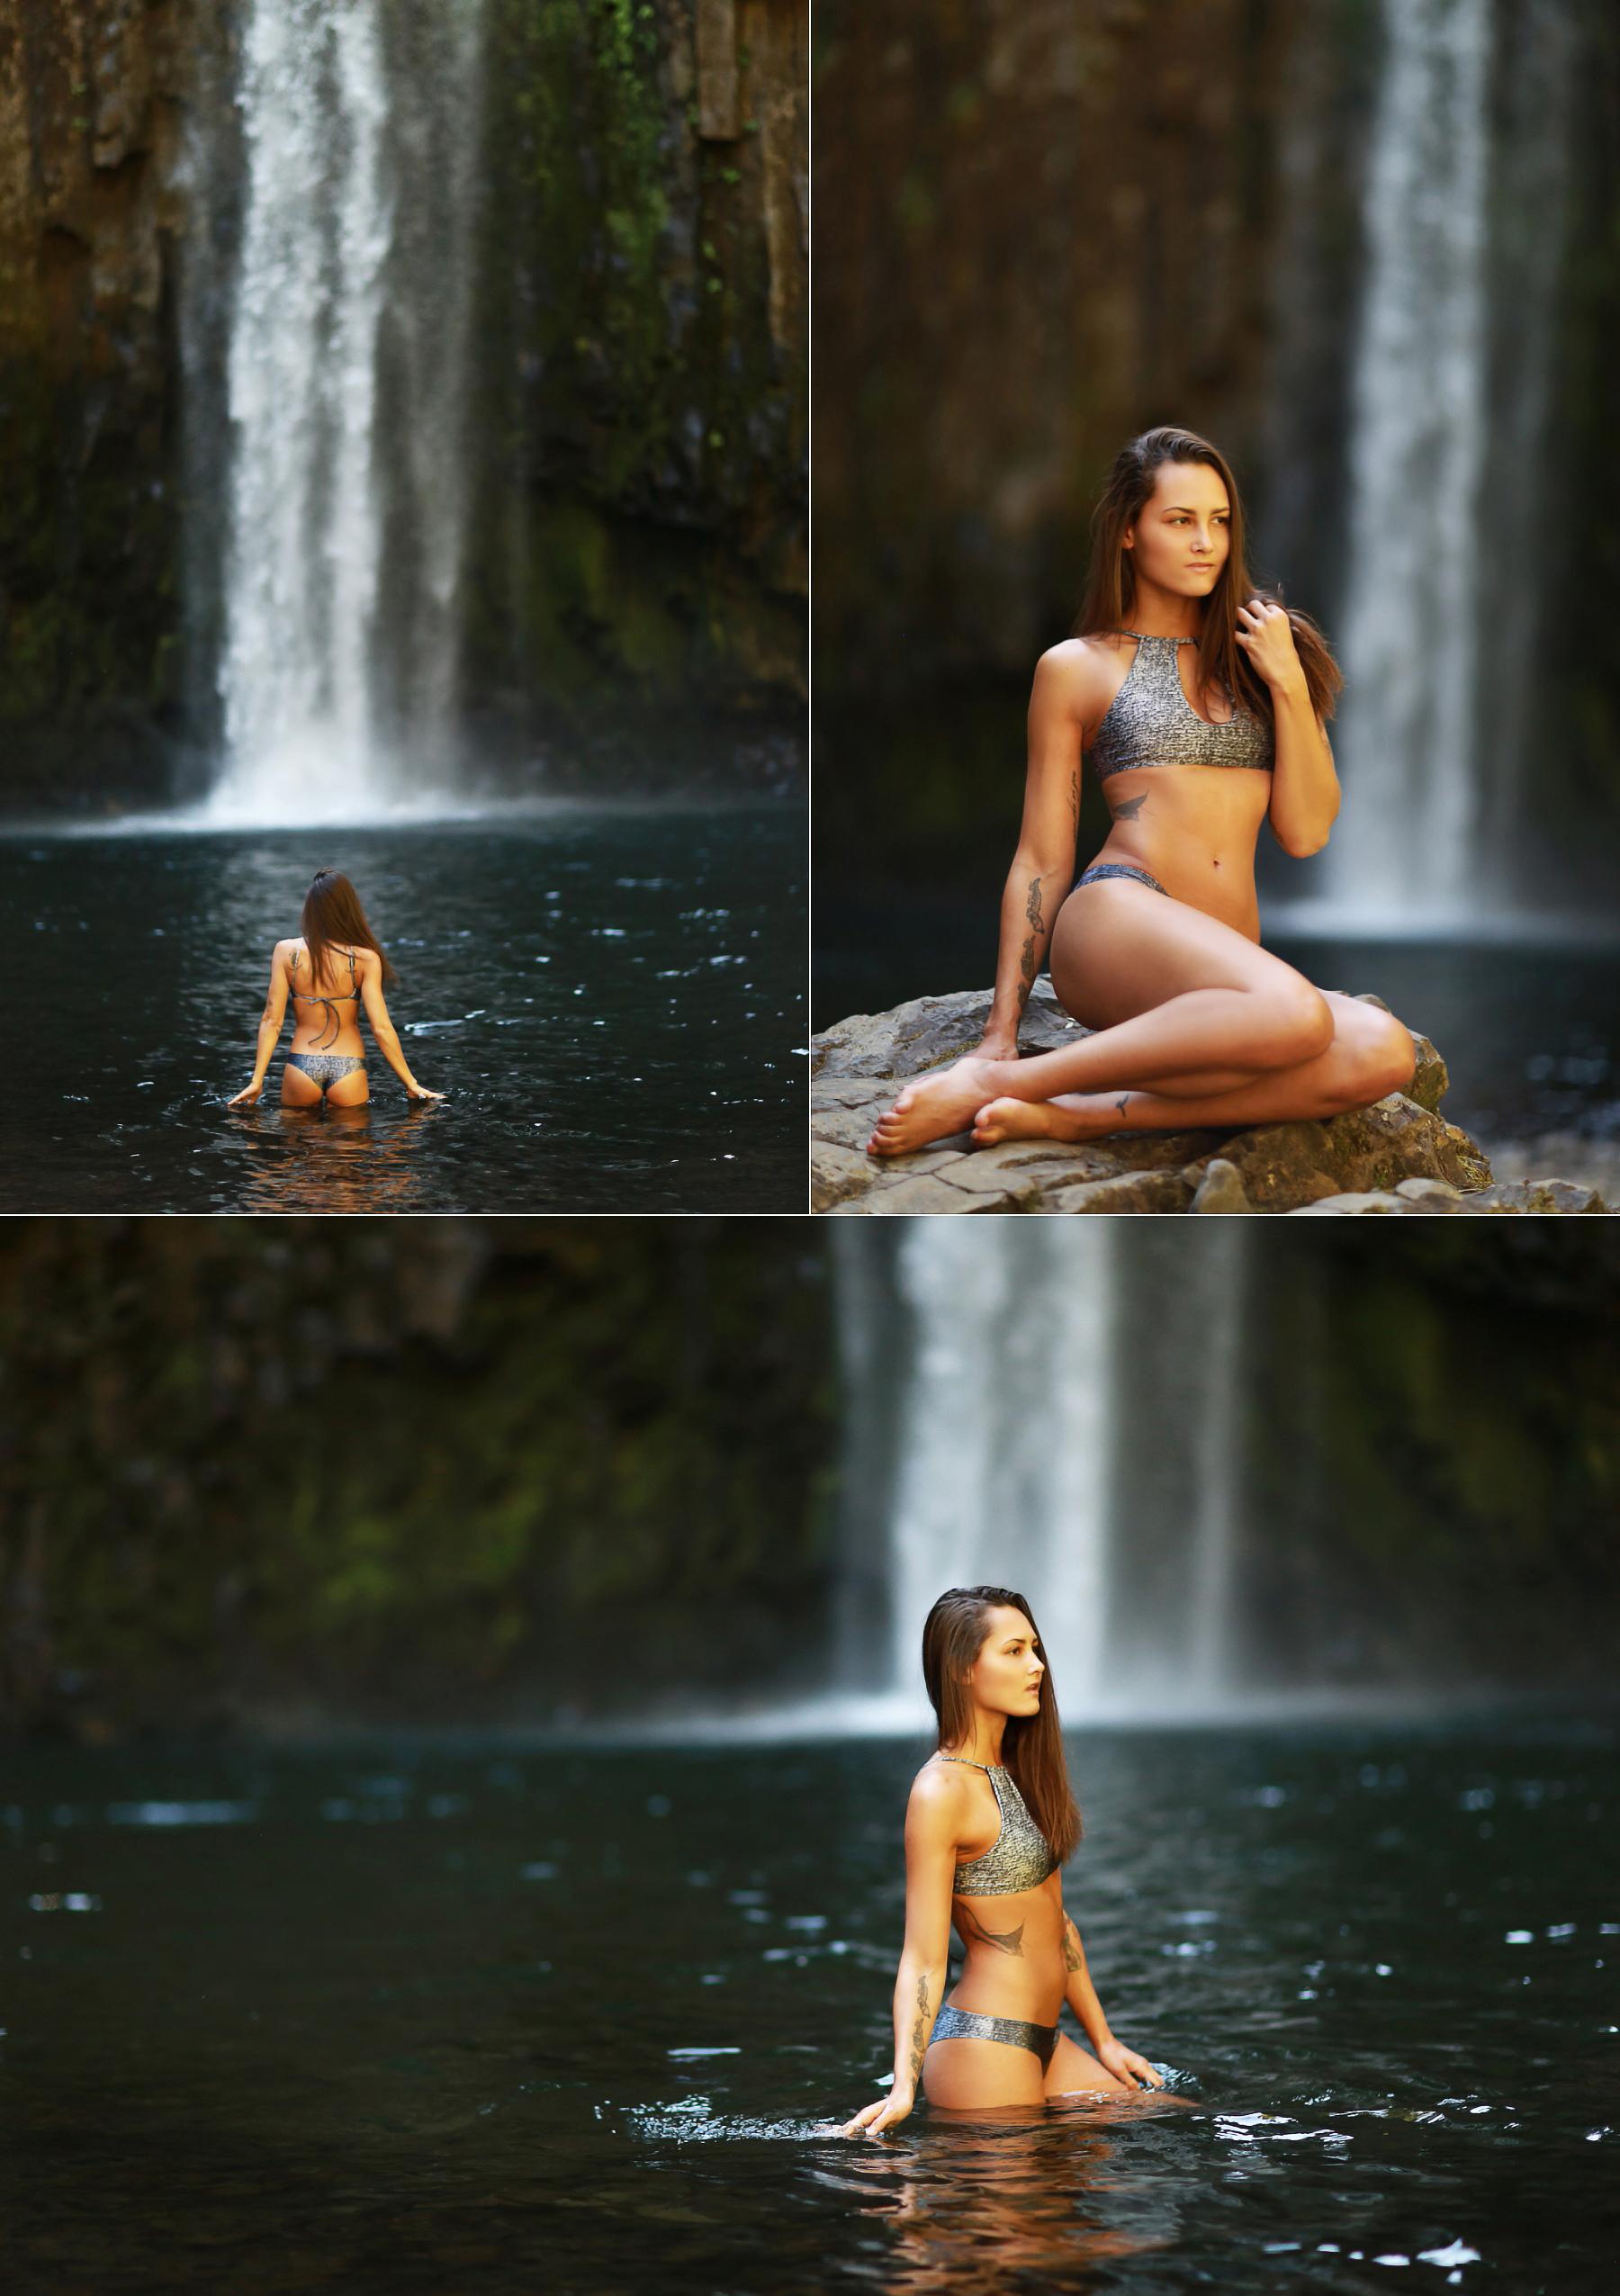 Danielle for Love Earth Mermaid